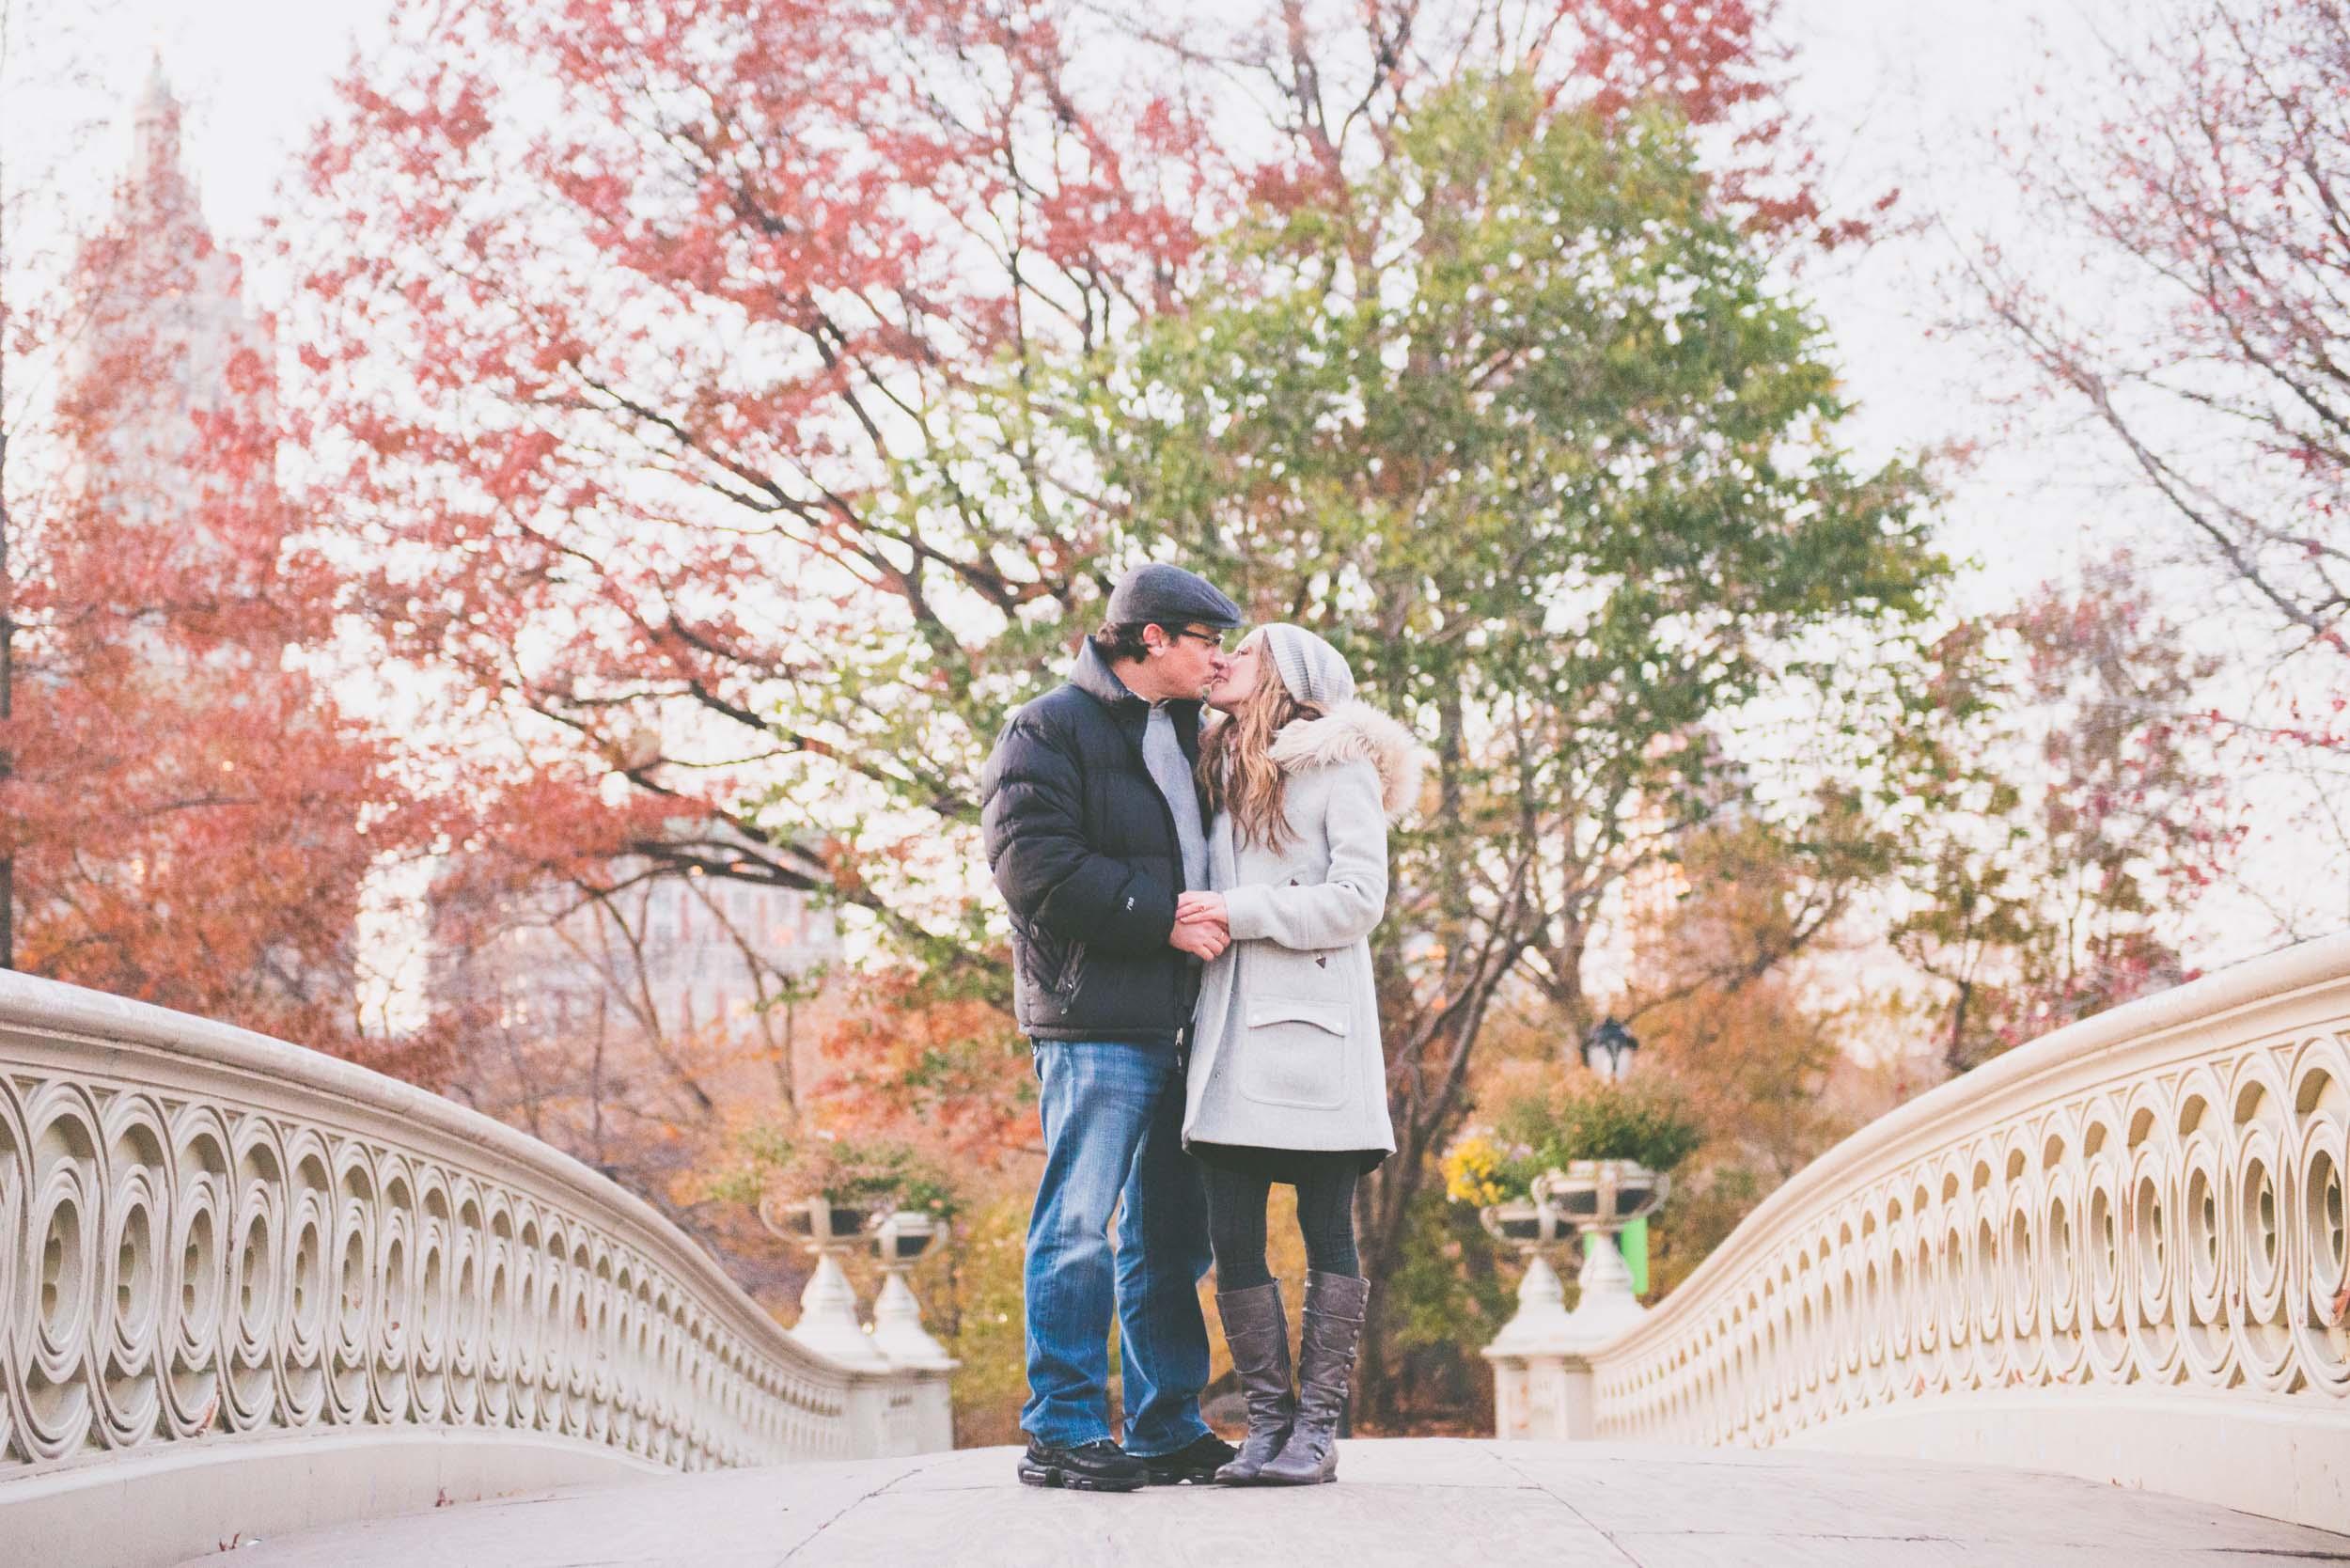 Kissing on Bow Bridge - Engagement Portraits - Photo credit Nicola Bailey.jpg